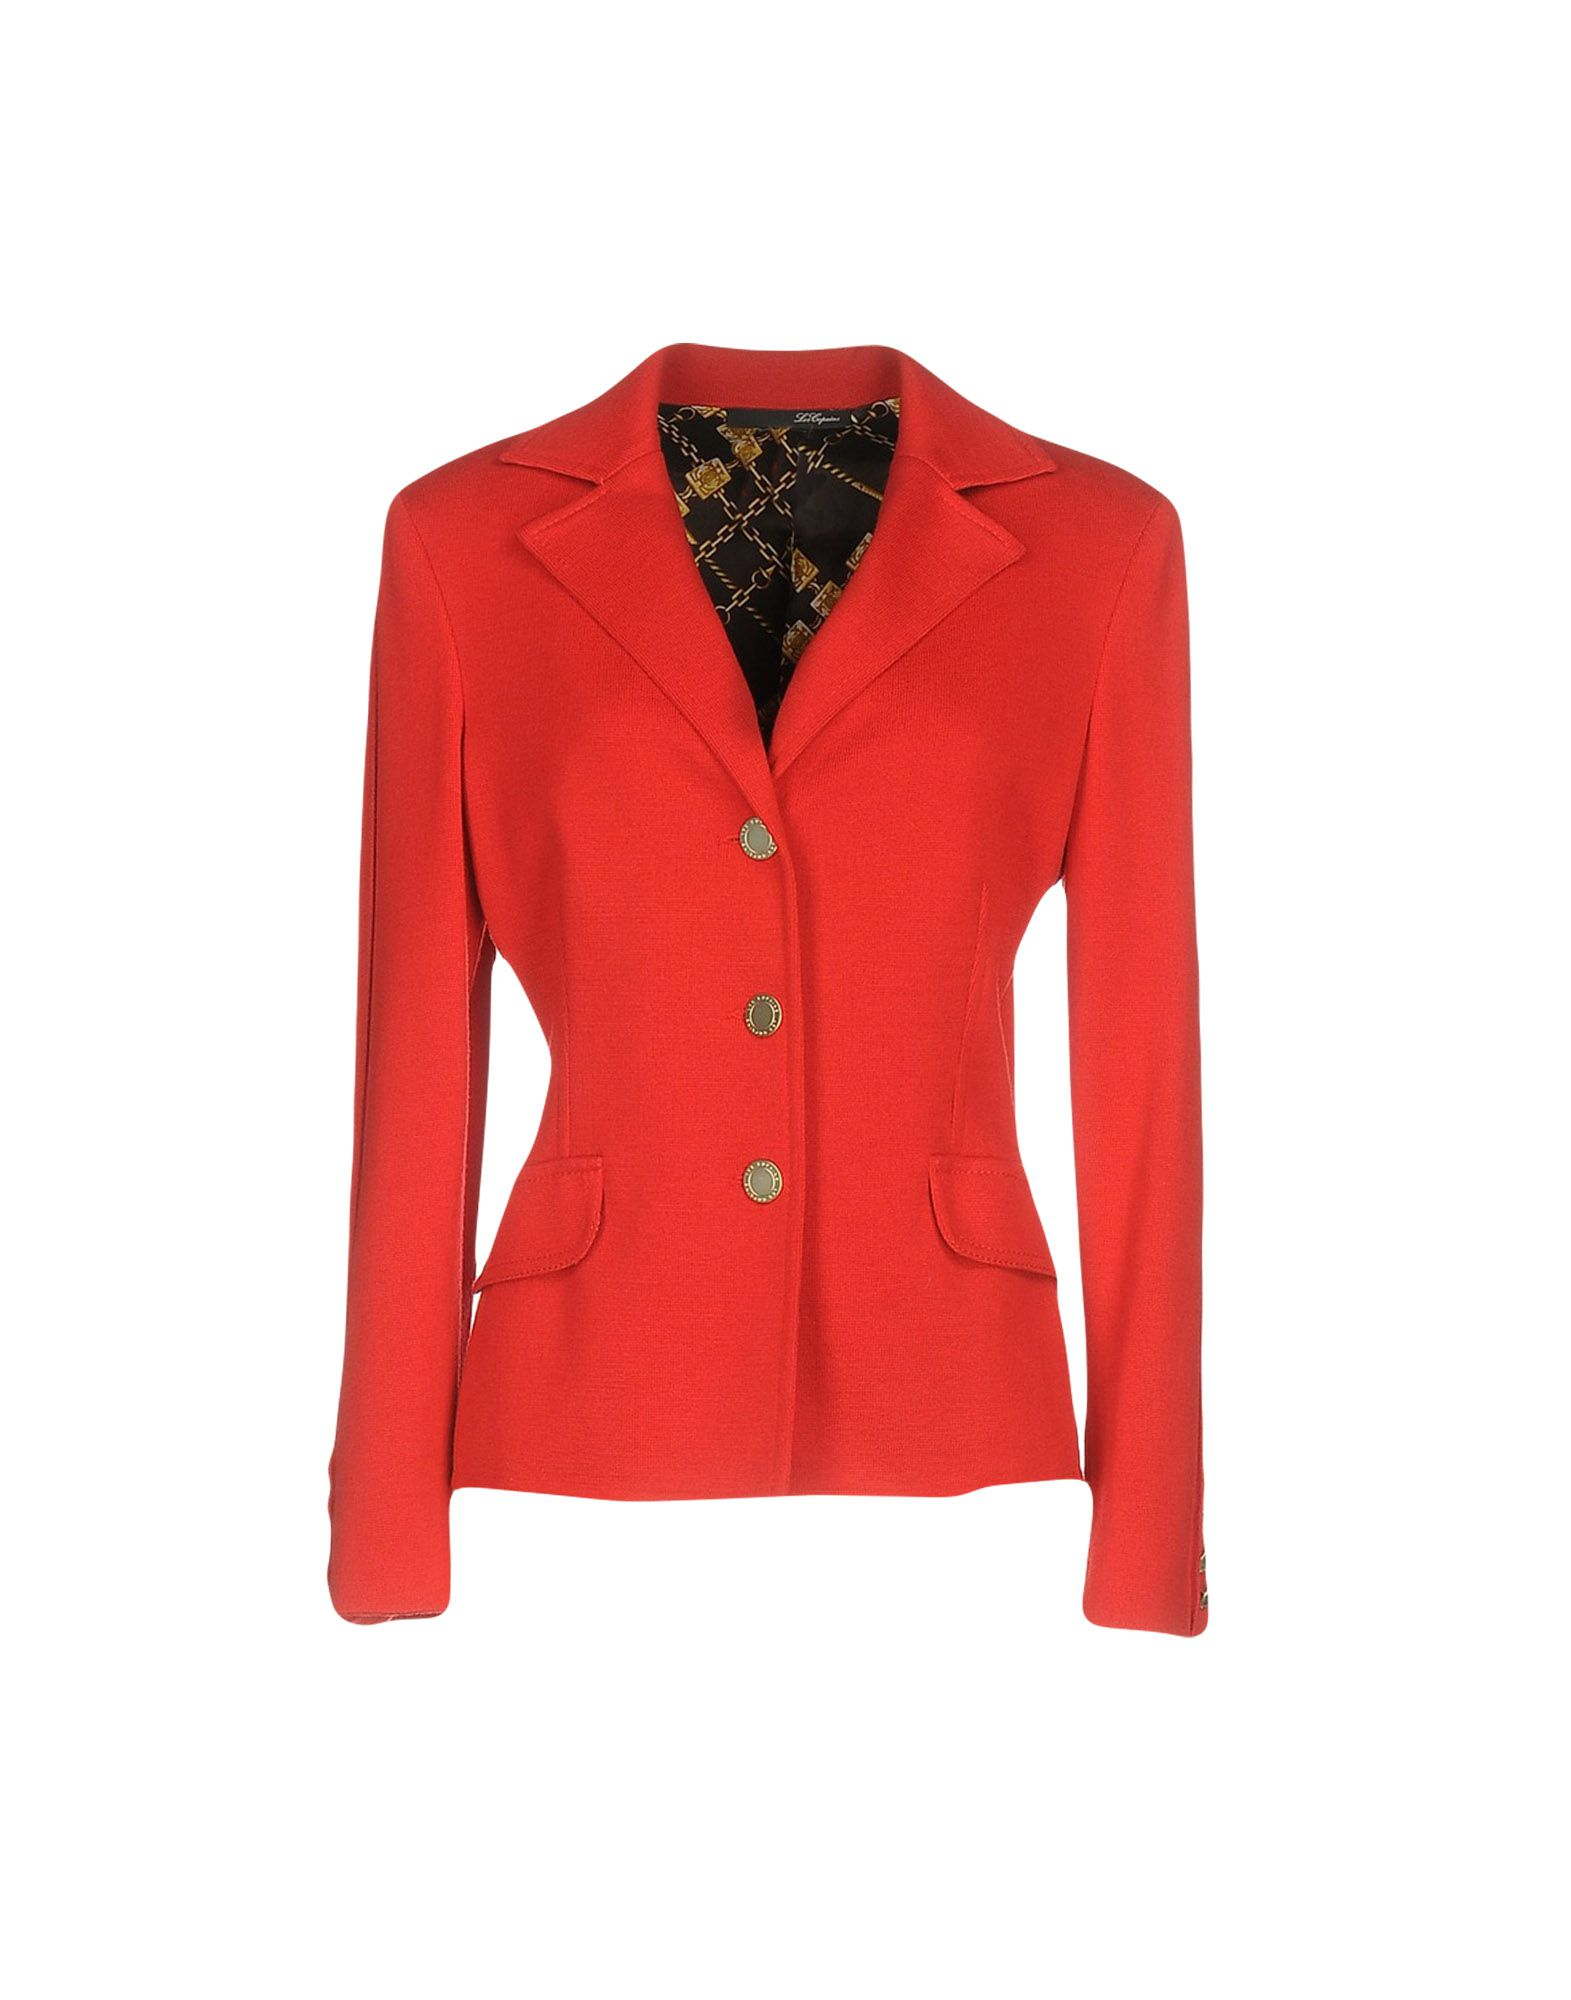 LES COPAINS Damen Jackett Farbe Rot Größe 6 - broschei